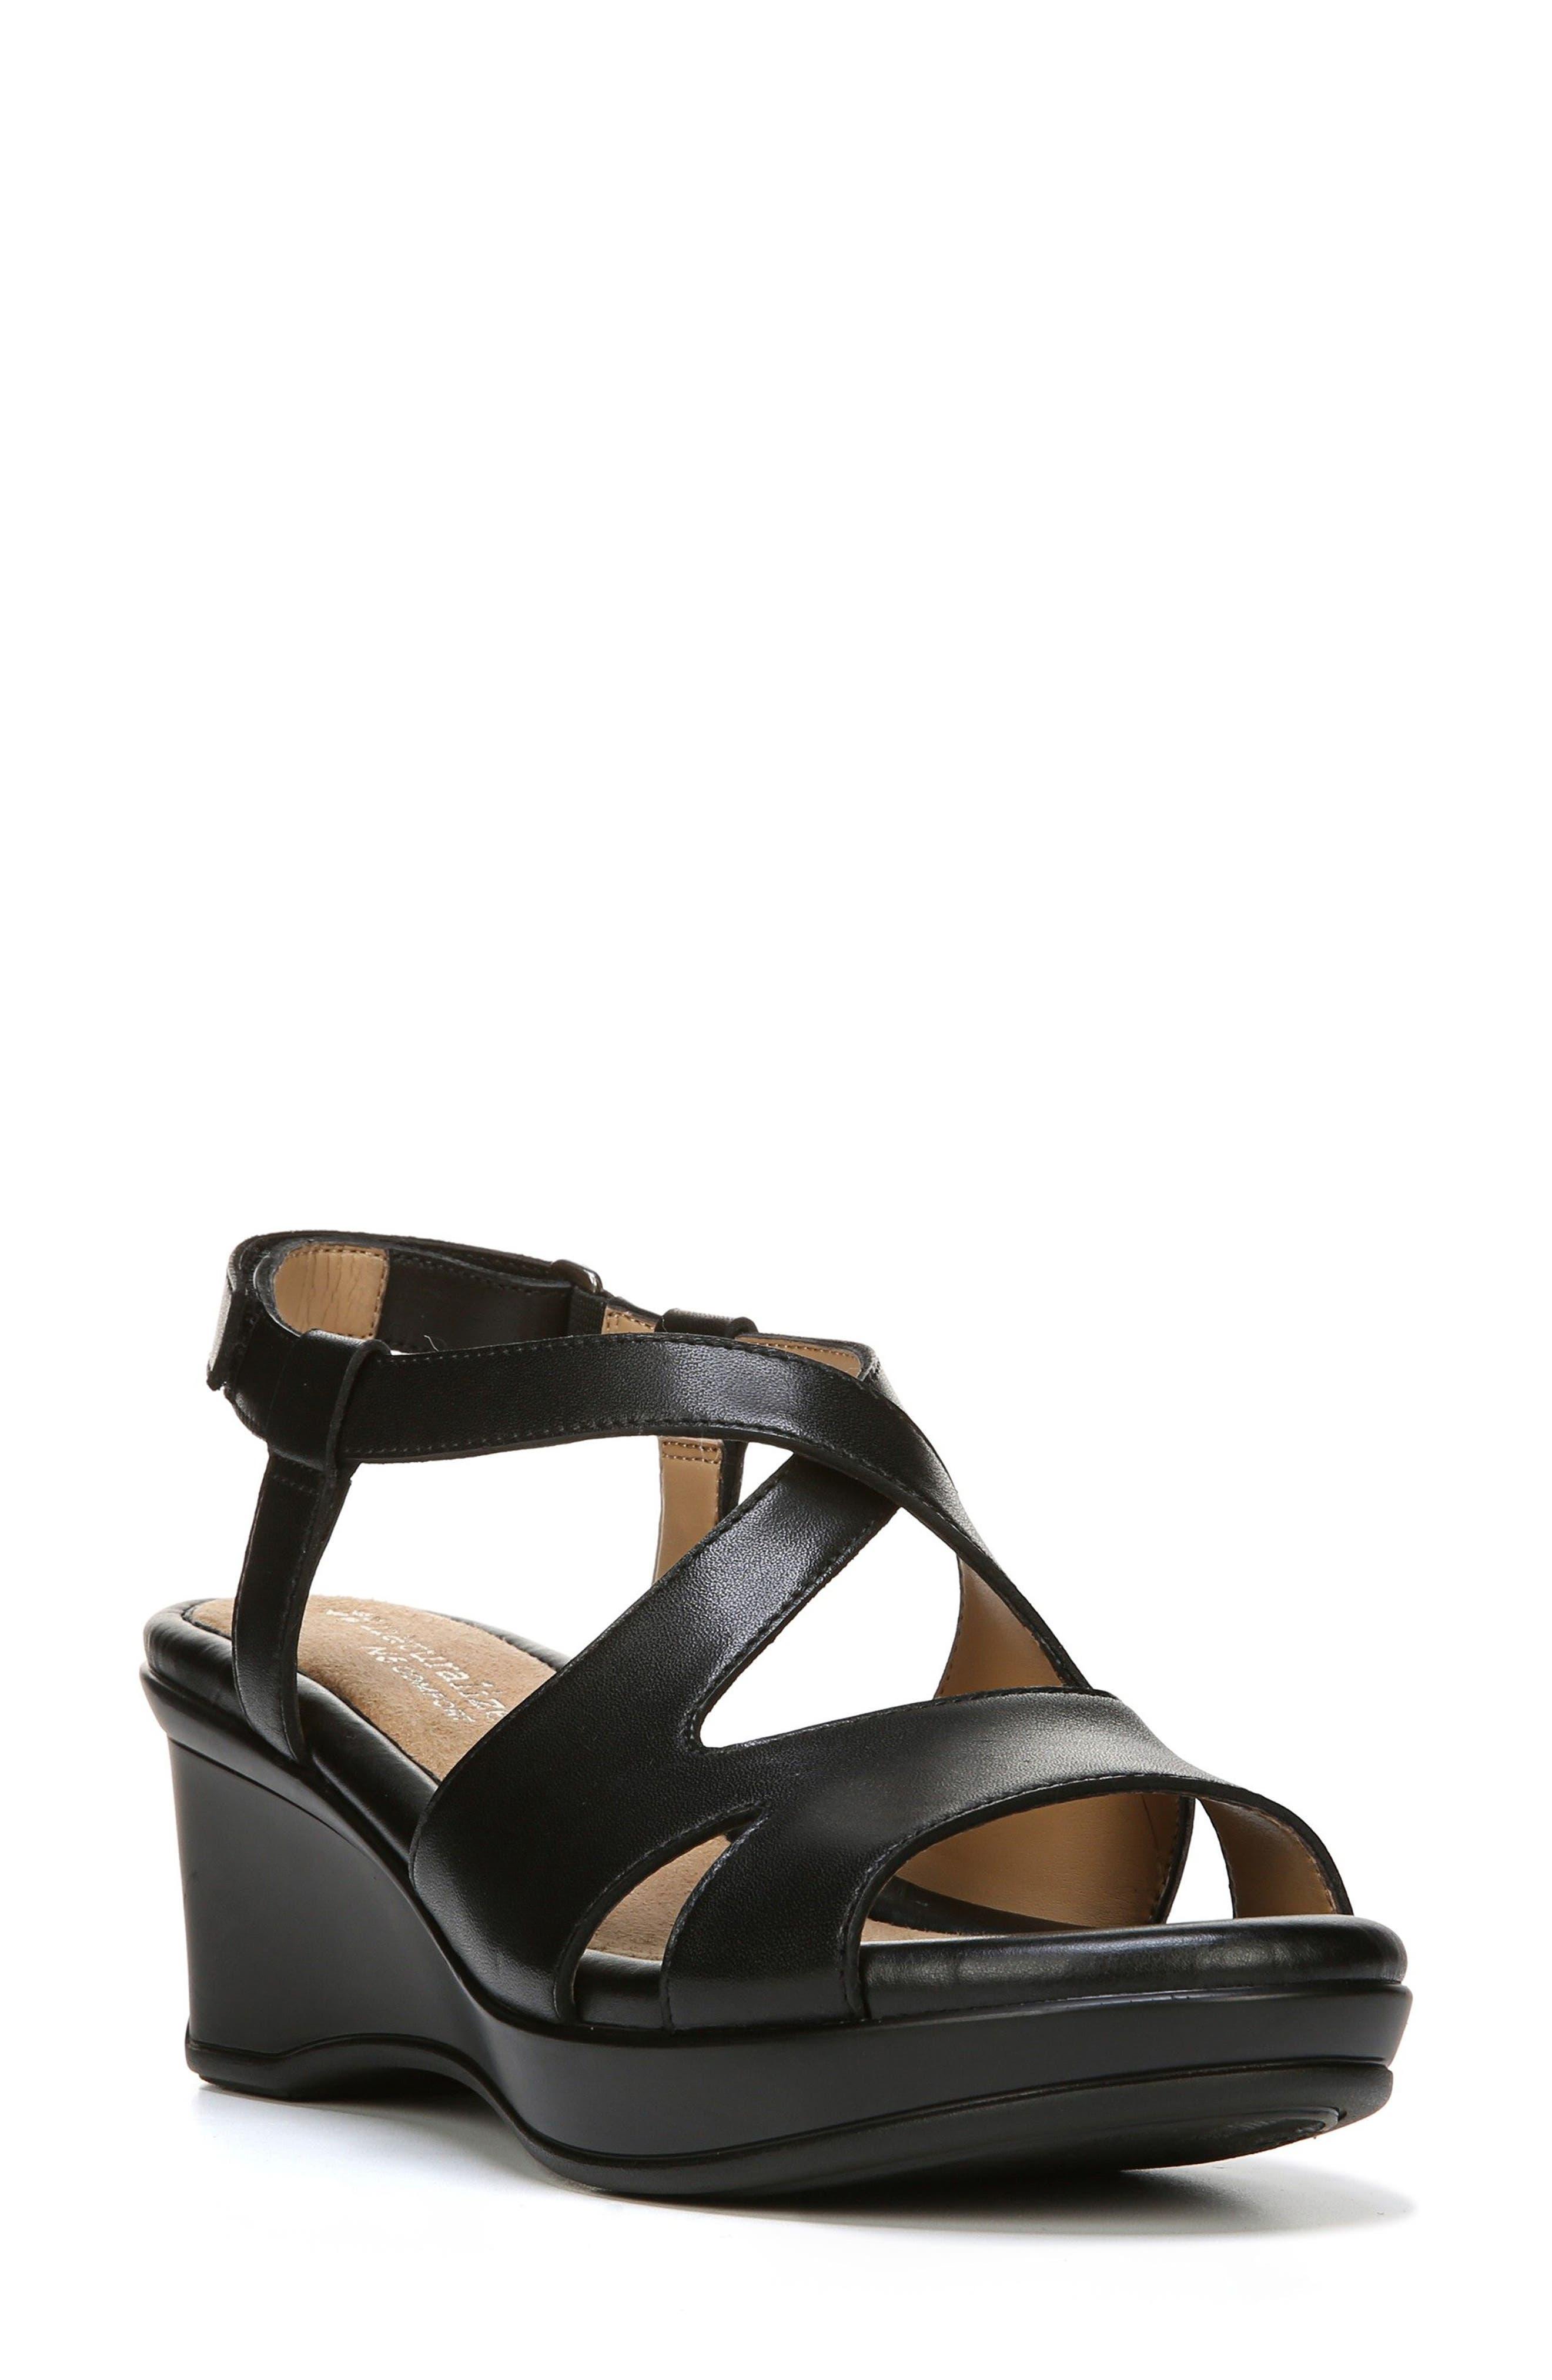 Vilette Wedge Sandal,                         Main,                         color, 001